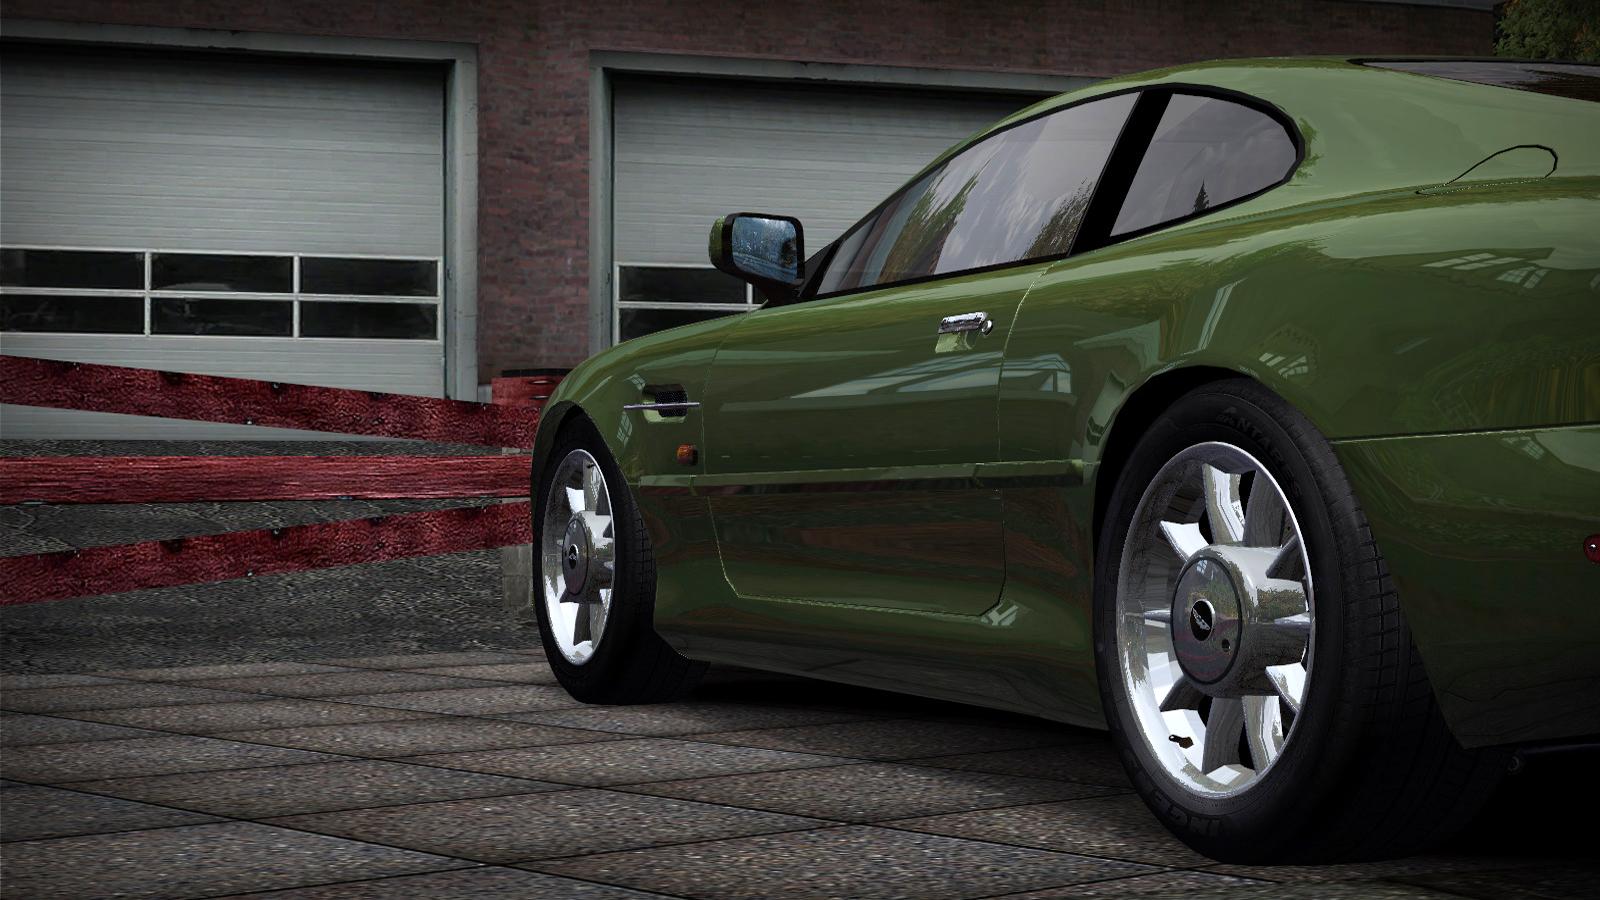 Speed 2020-01-05 19-08-11-834.jpg - Need for Speed: Most Wanted (2005) Aston Martin DB7 Vantage, Автомобиль